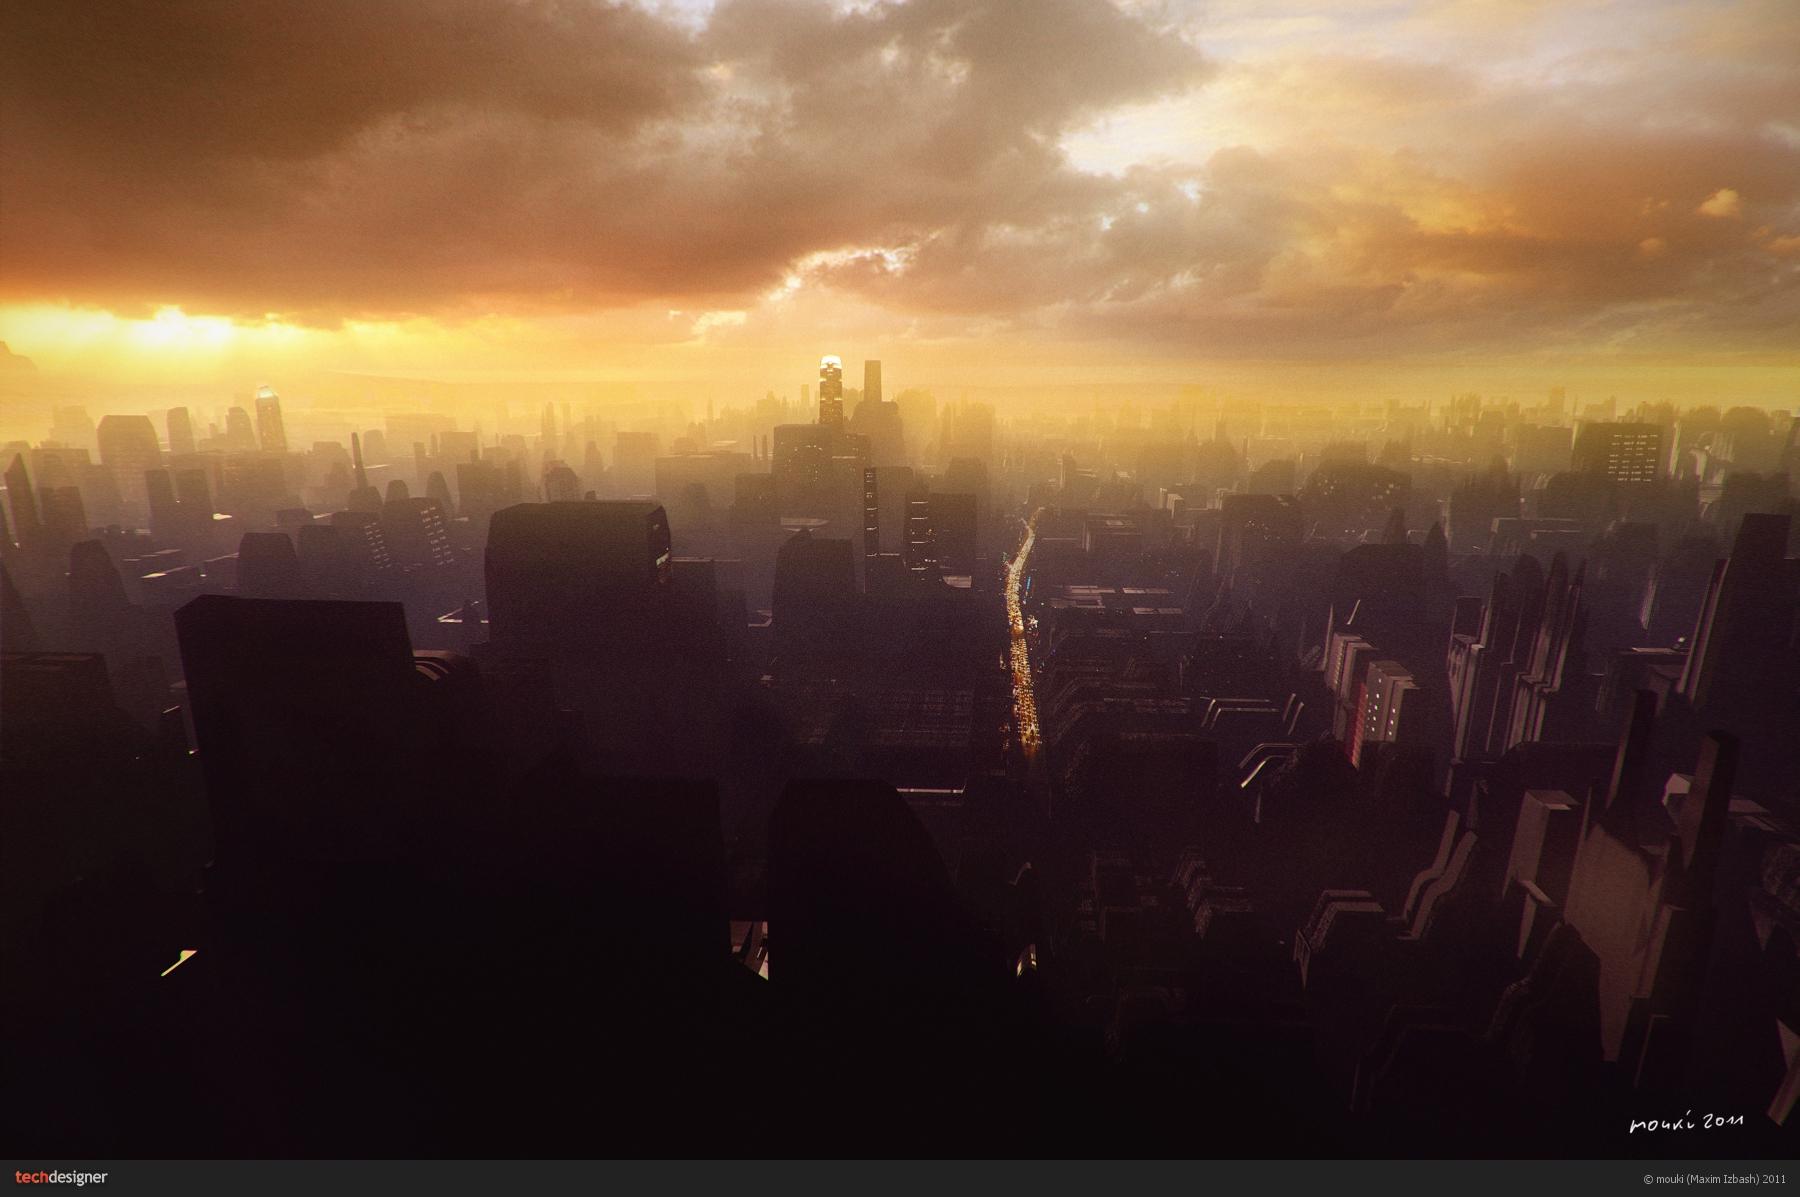 Futured City